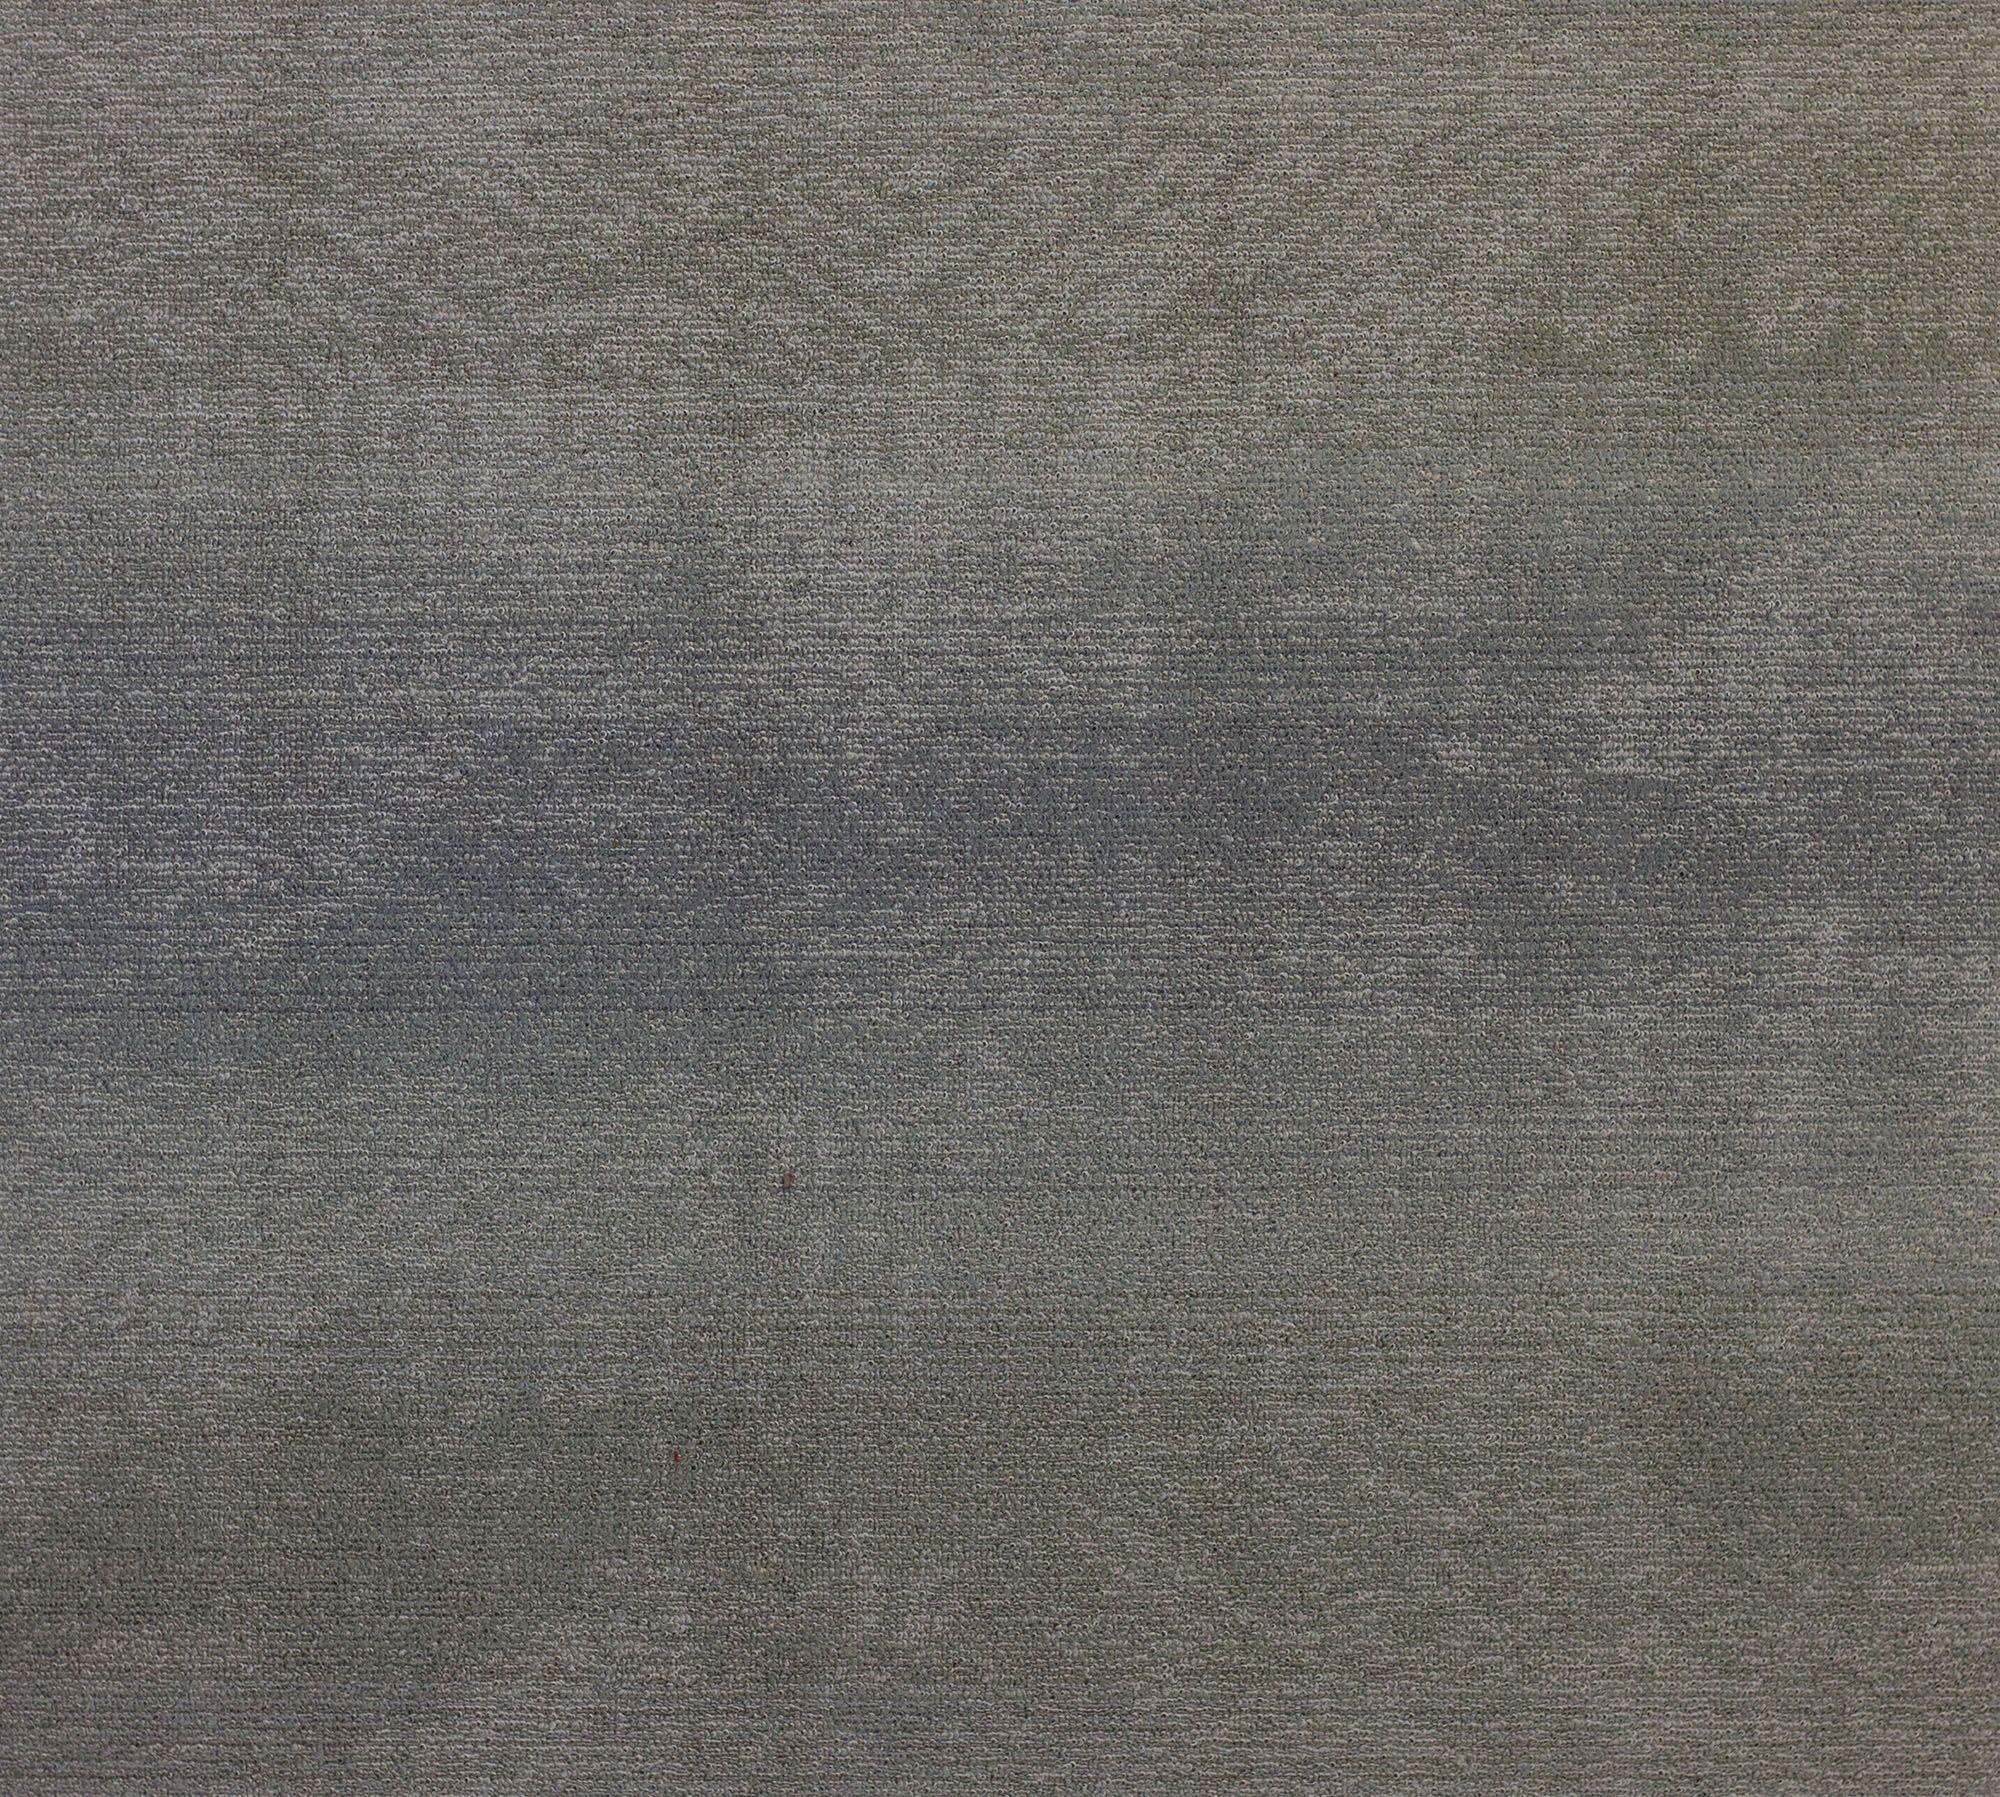 Carpet Tile 350 In 2020 Carpet Tiles Carpet Tiles